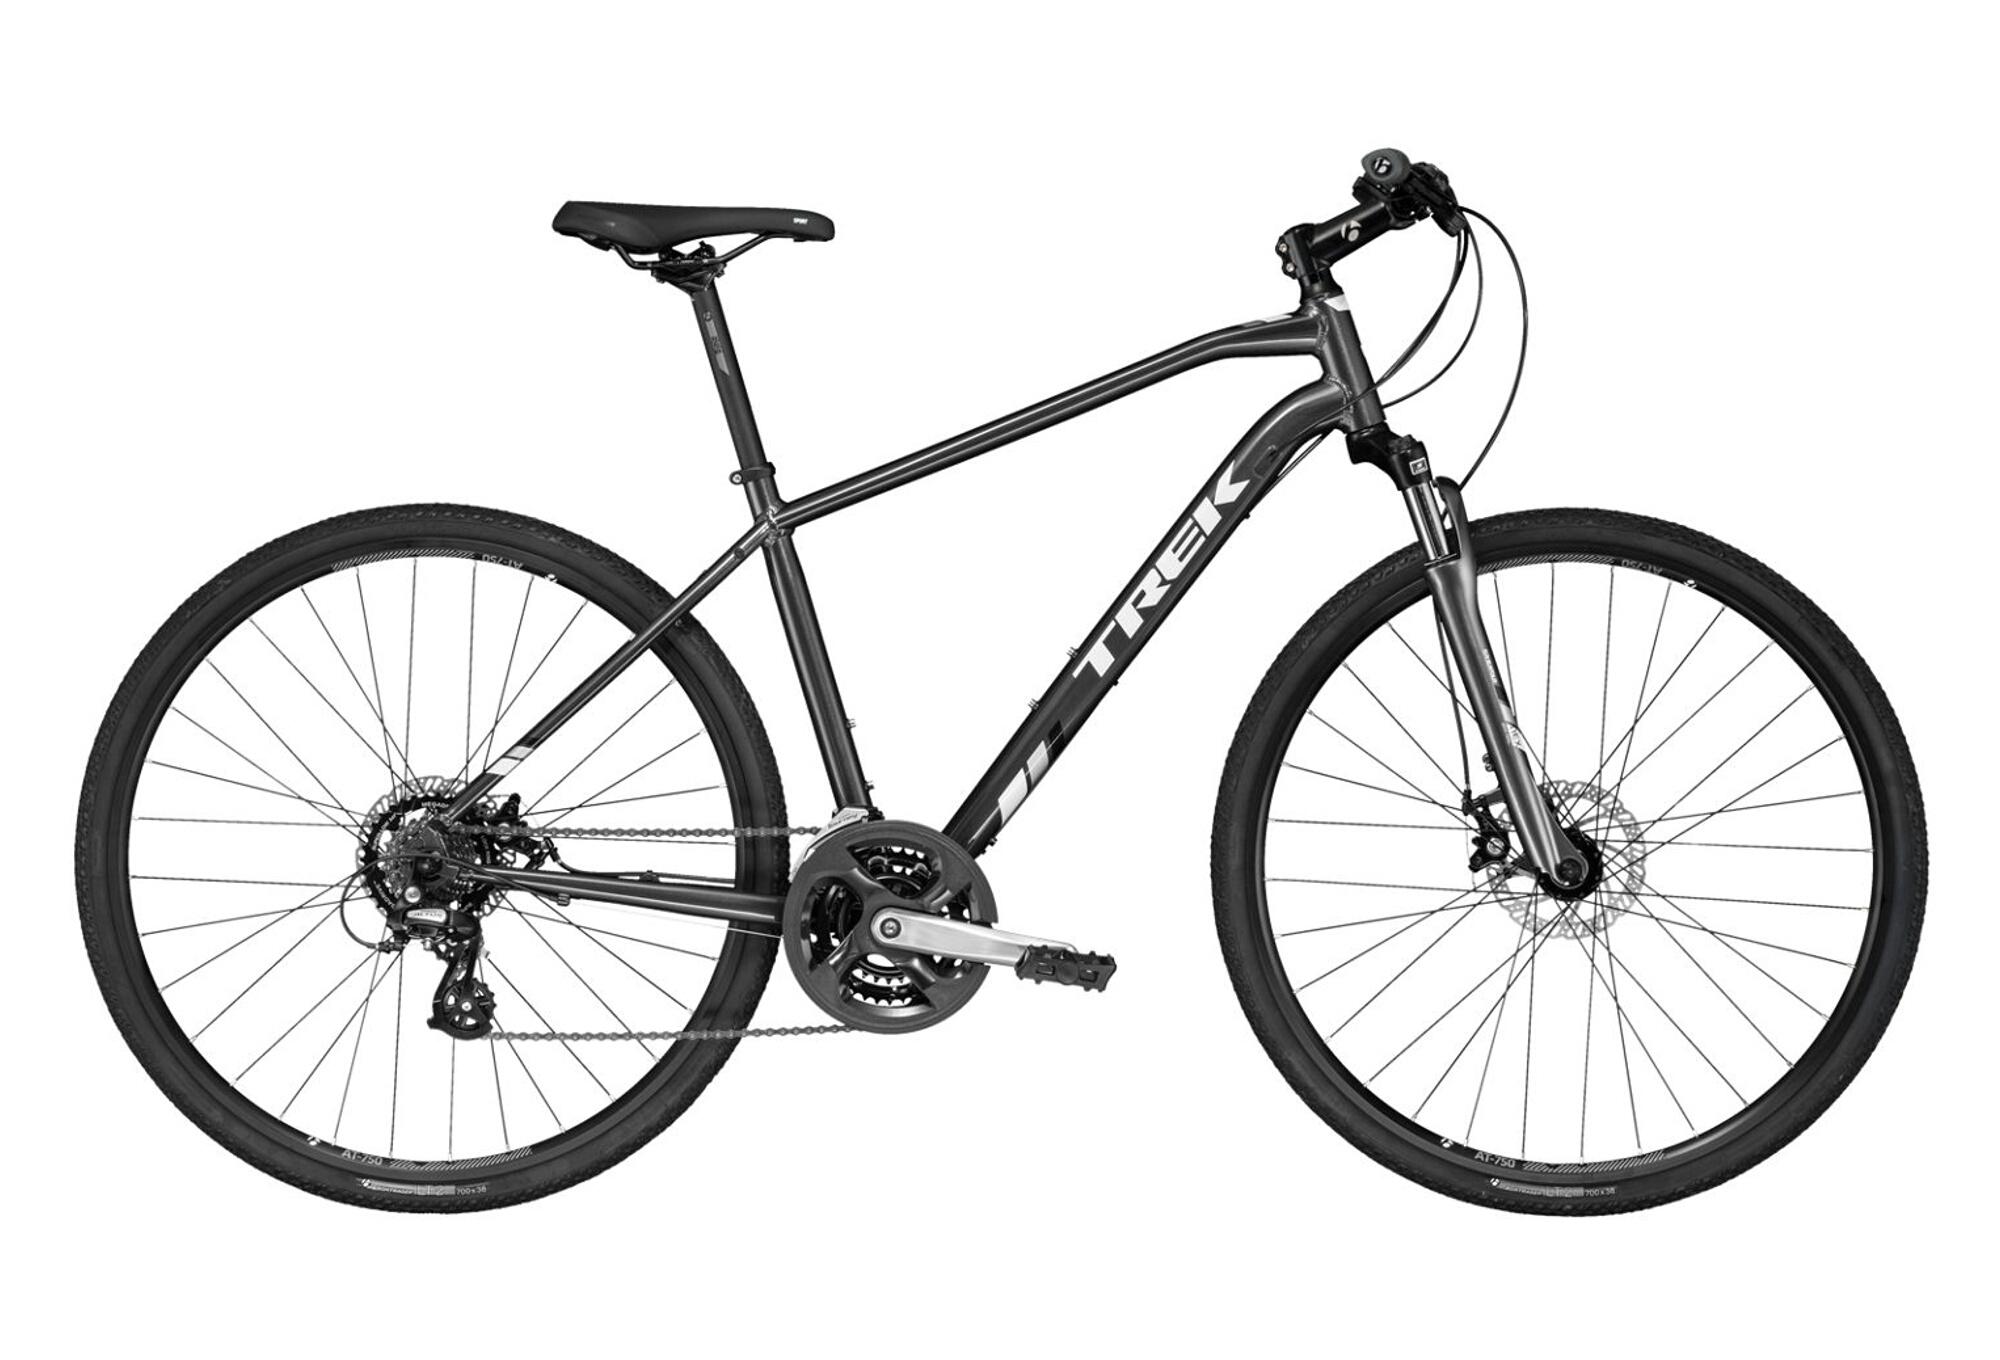 Trek DS 1 Urban Bike Shimano Altus 7s Grey 2017